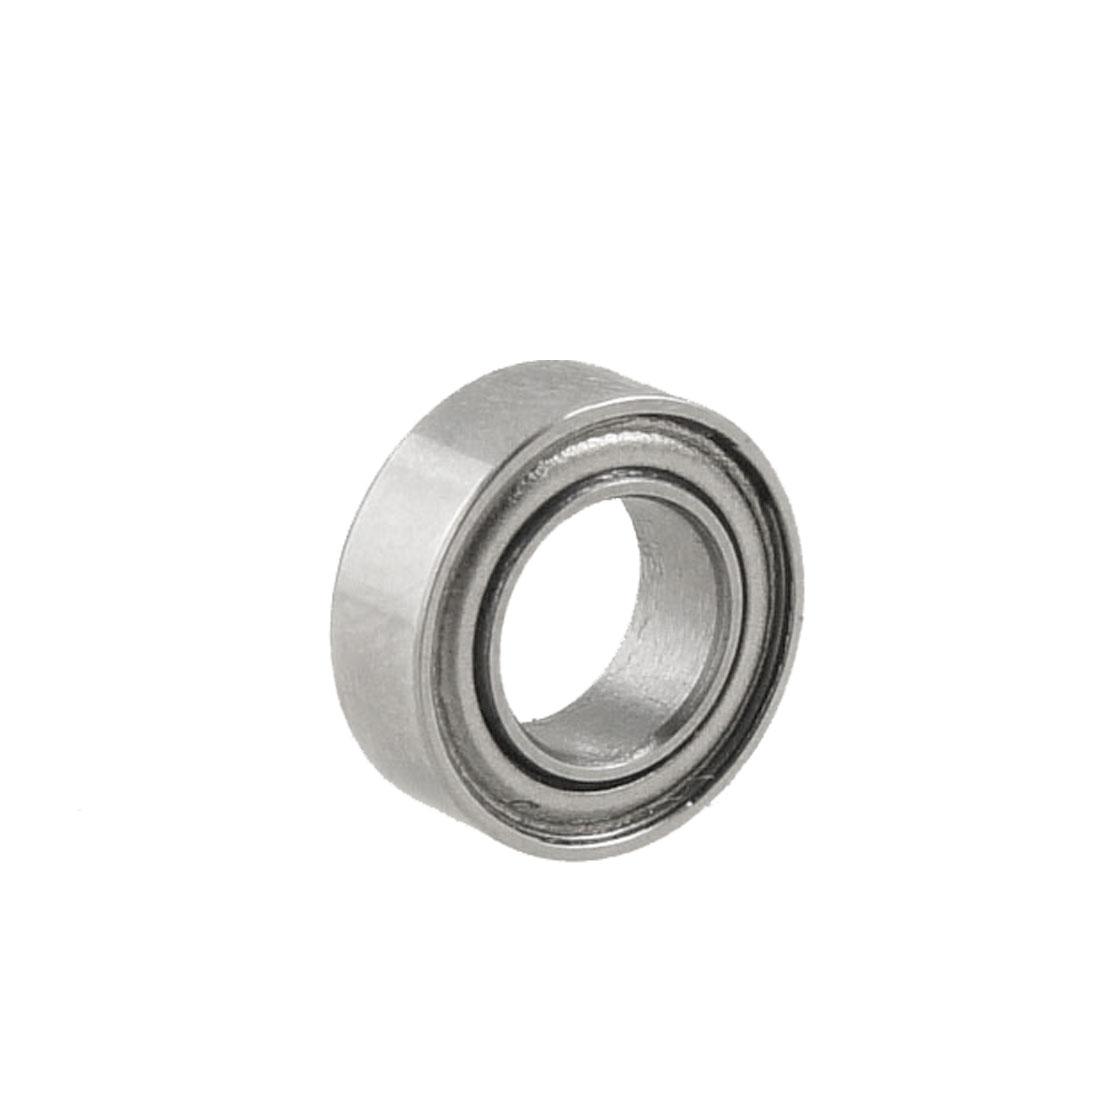 Silver Tone Metal 9mm x 5mm x 3mm Shield Premium Ball Bearing